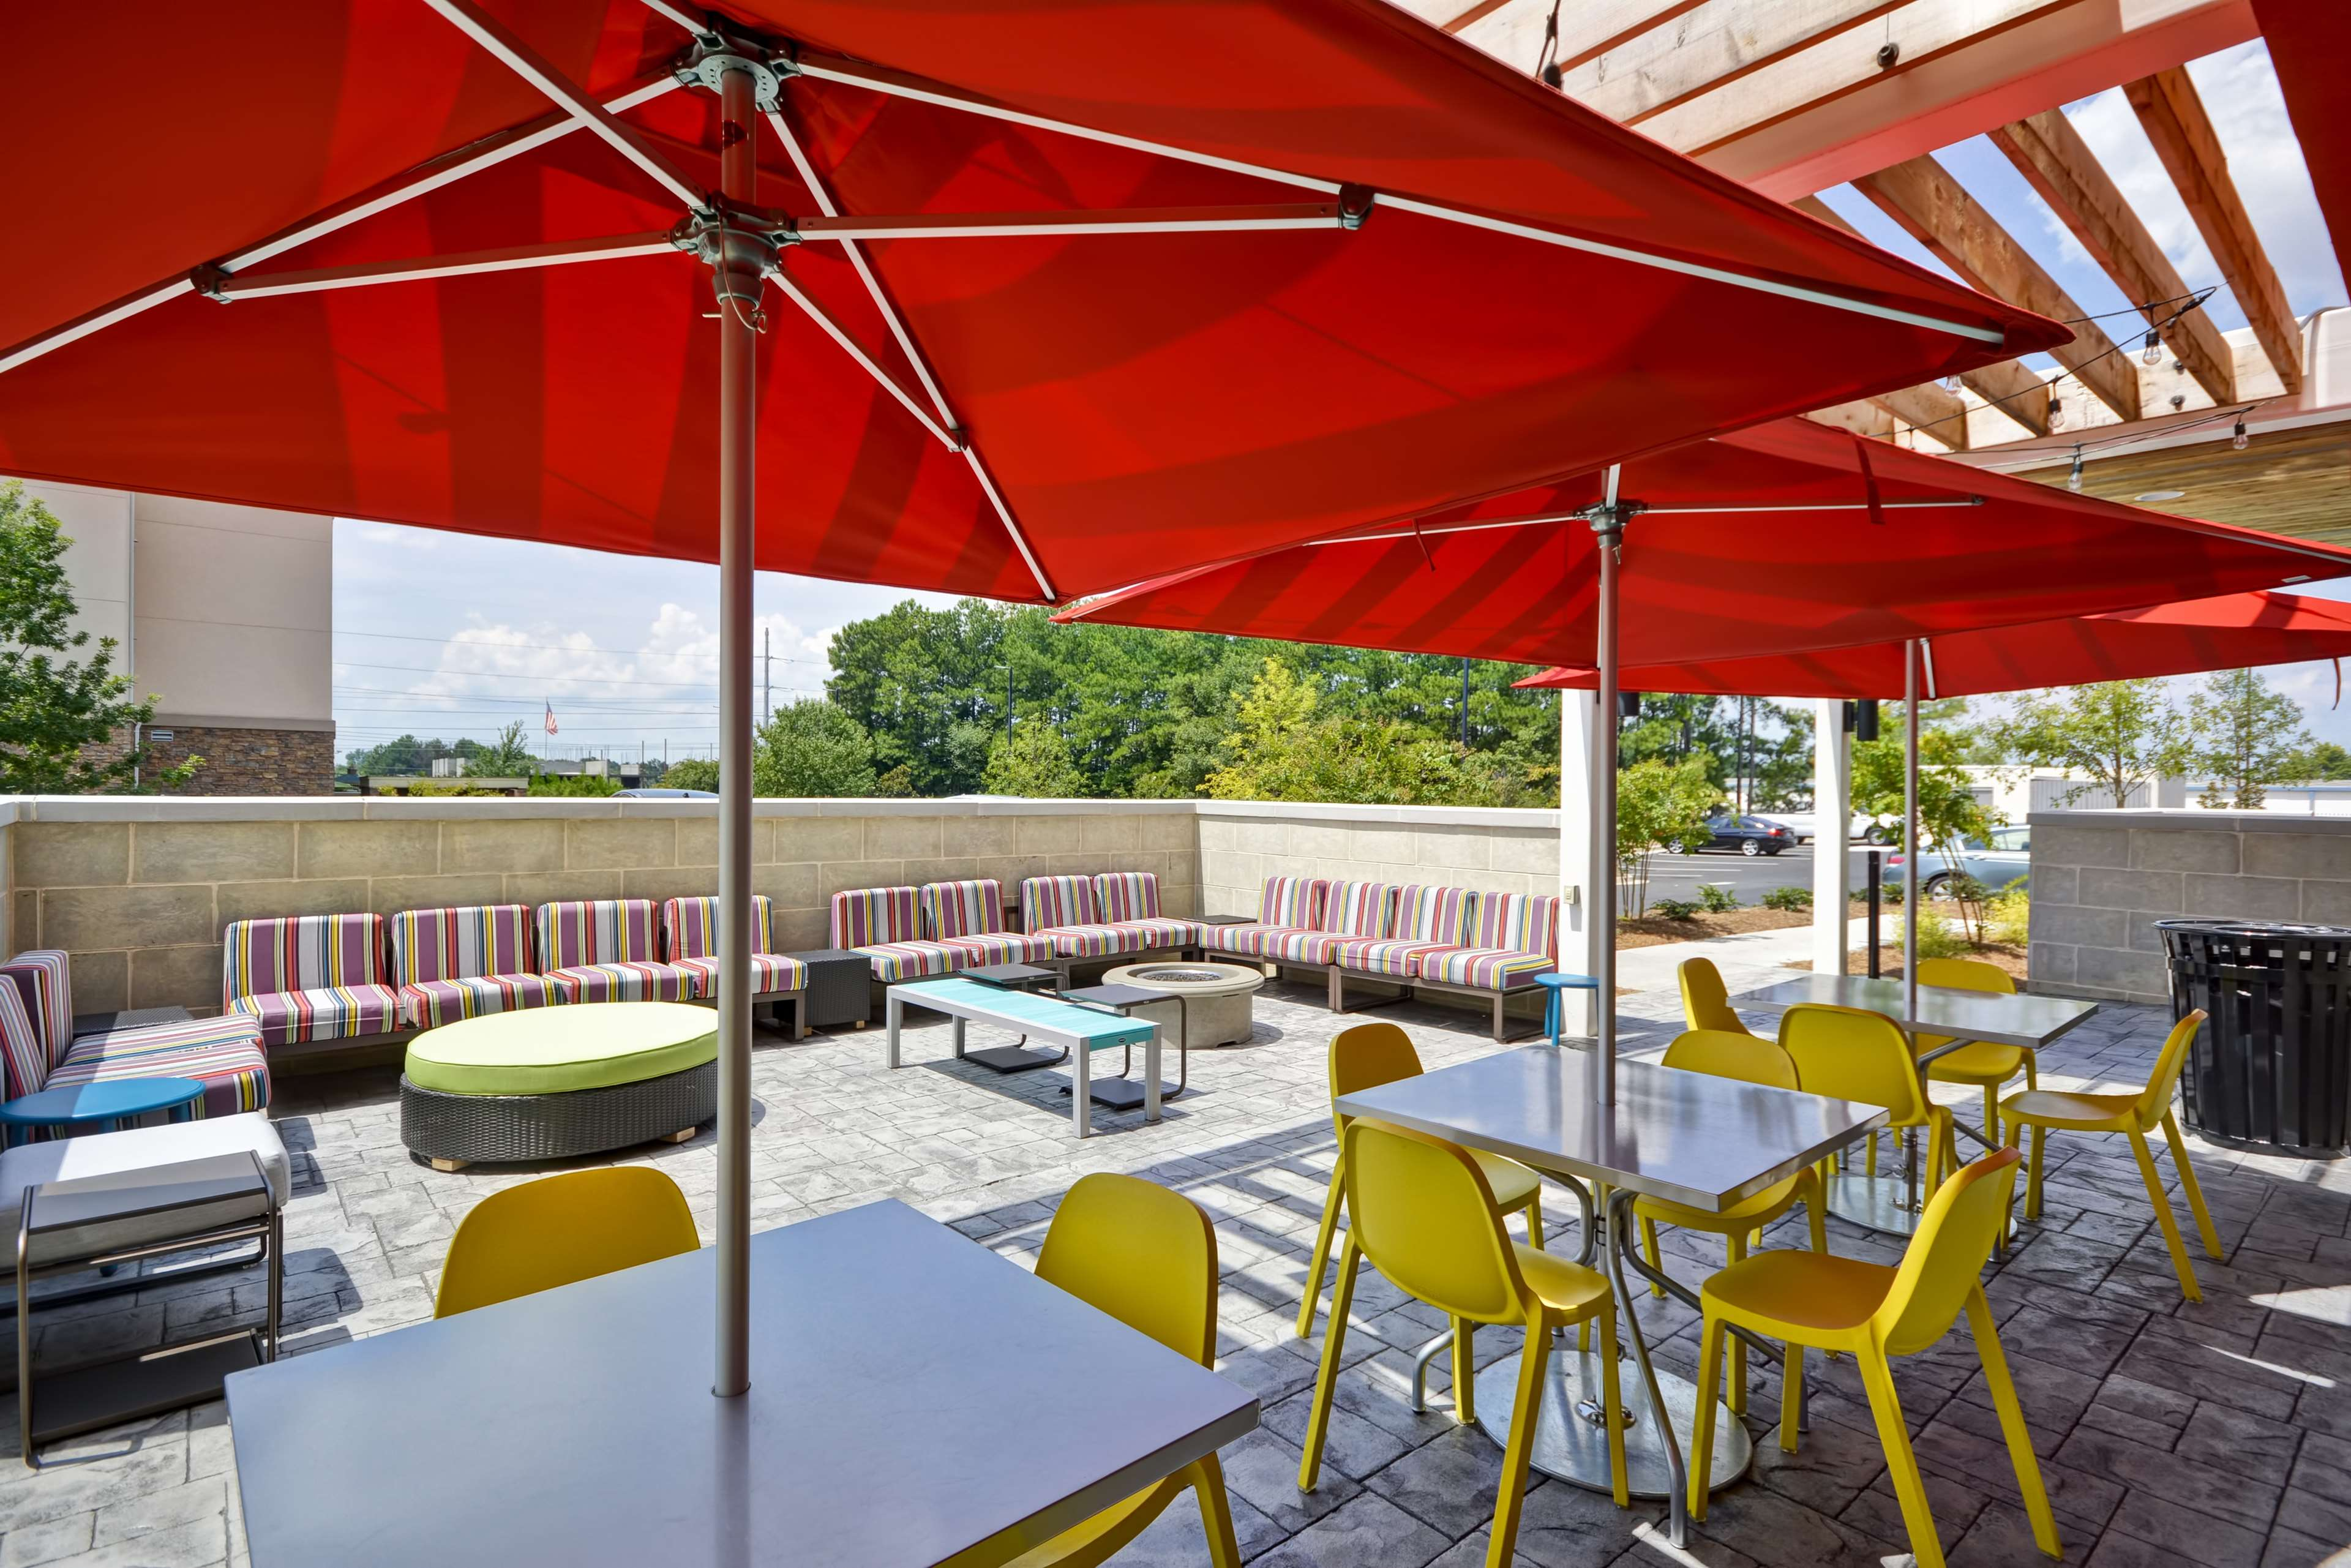 Home2 Suites by Hilton Atlanta West Lithia Springs image 7